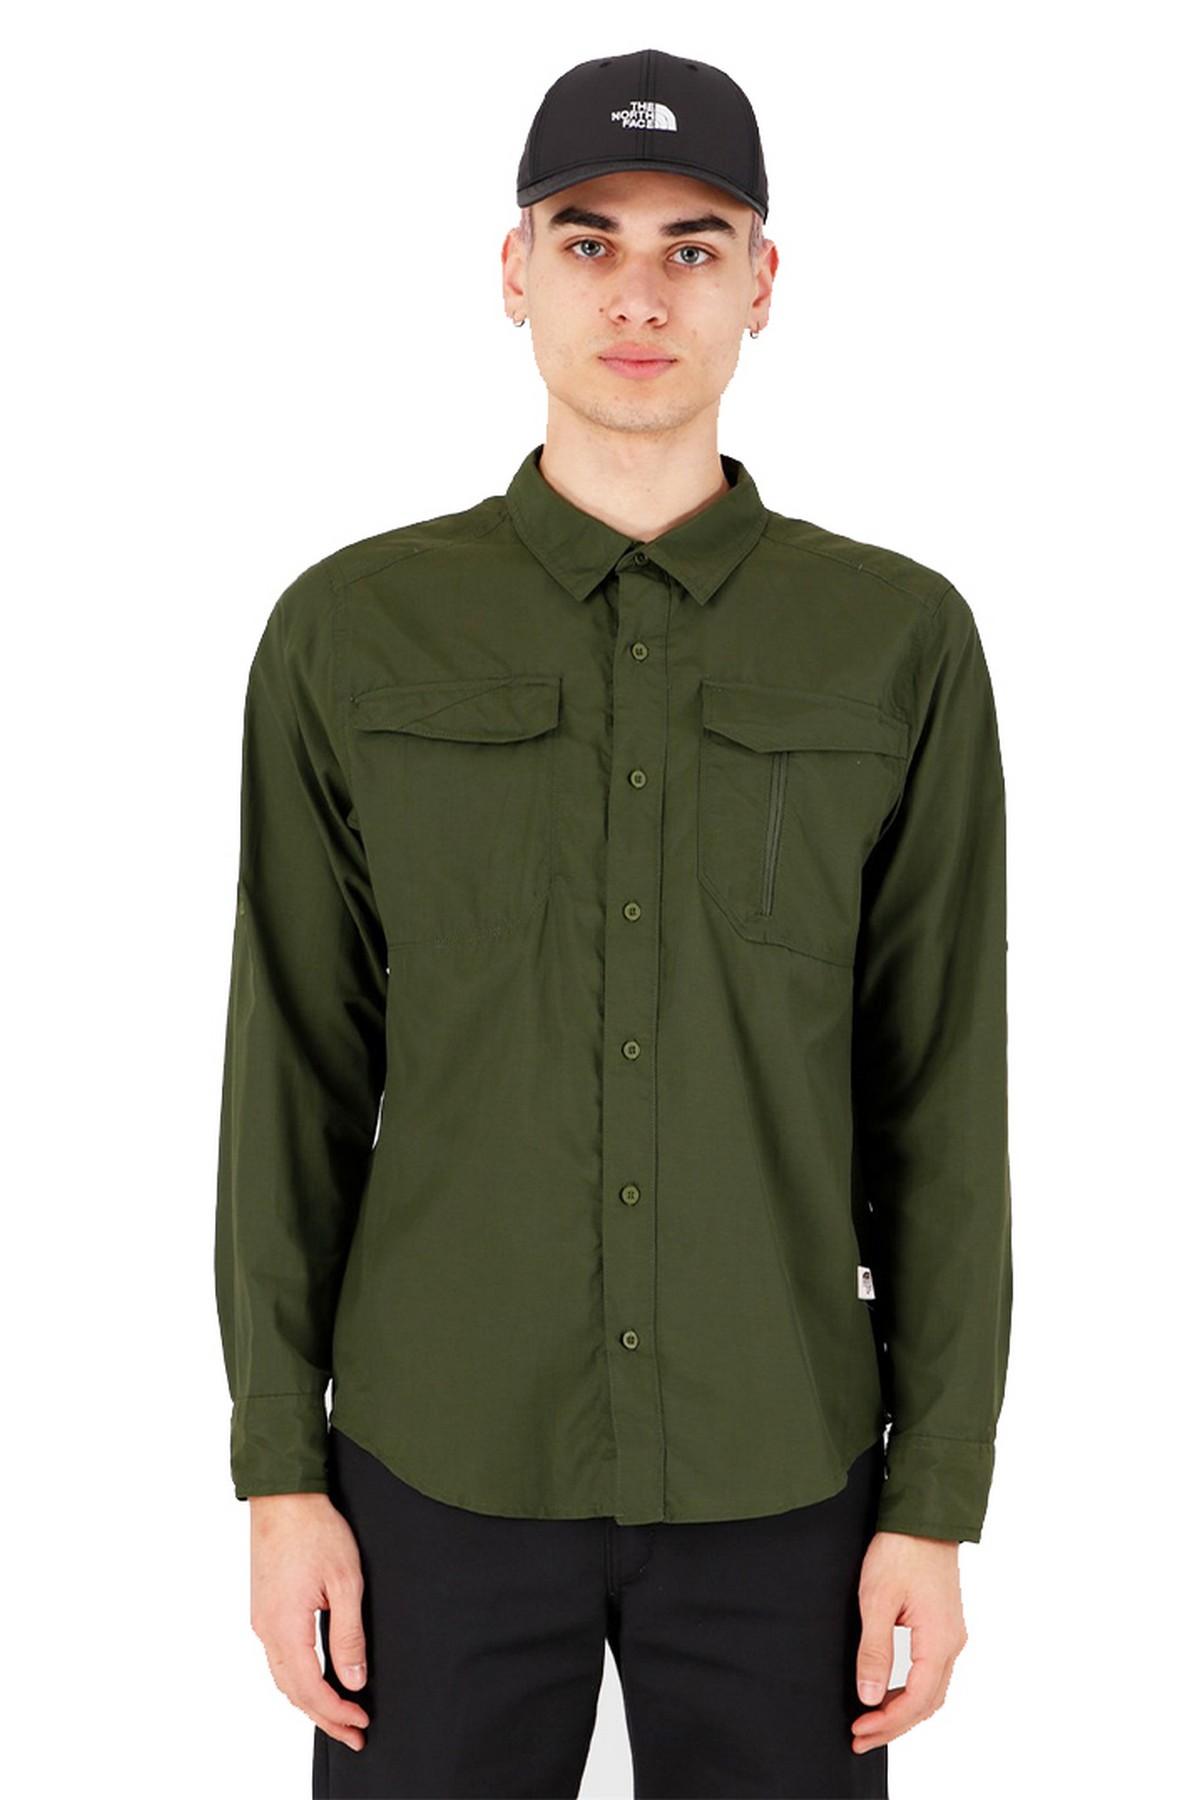 The North Face Sequoıa Uzun Kollu Erkek Gömlek Yeşil (NF0A2XJW37X1SS-48)